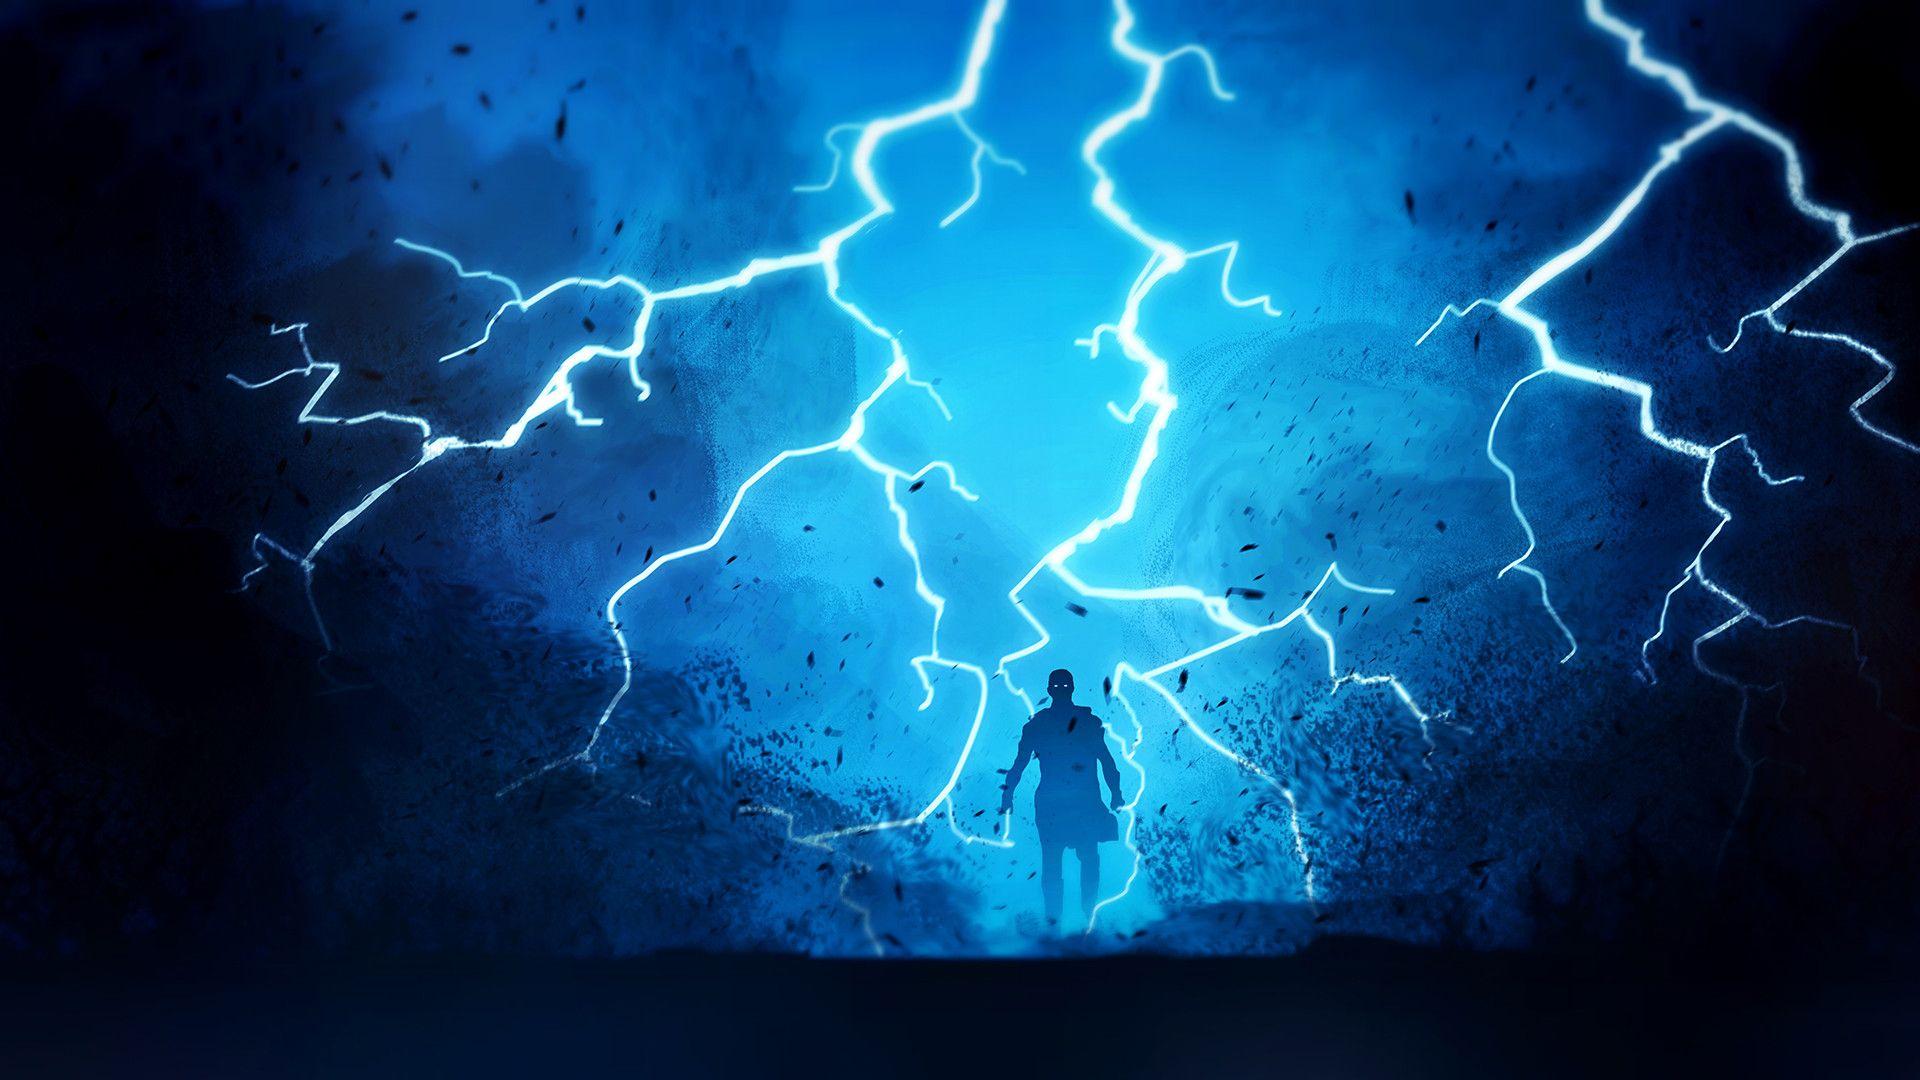 Lightning Bolt computer Wallpaper